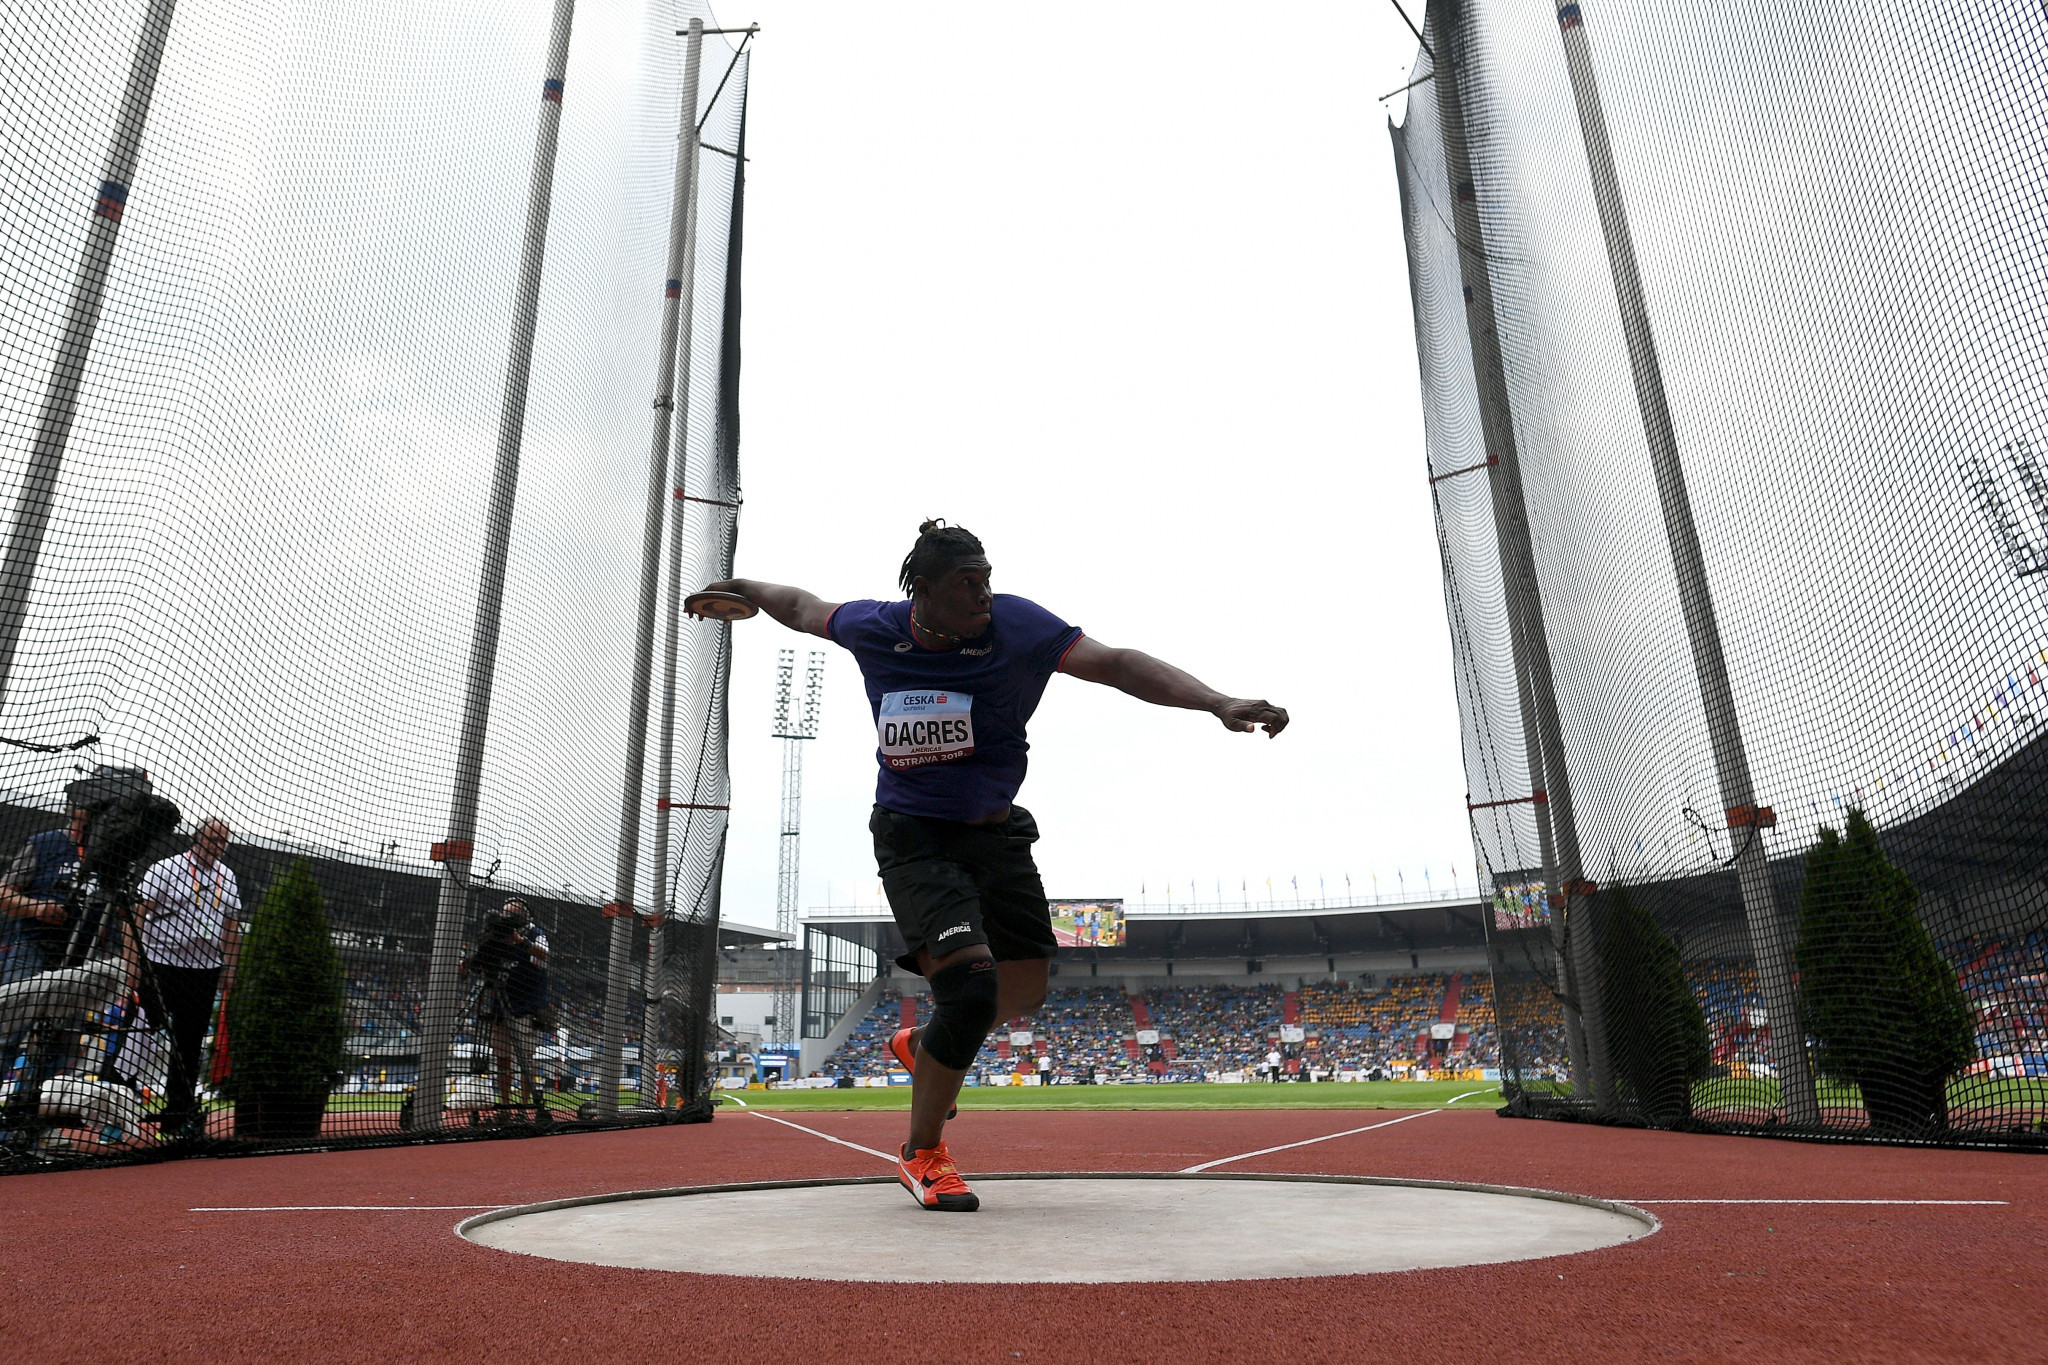 Fedrick Dacres will aim to defend his men's discus title ©Getty Images